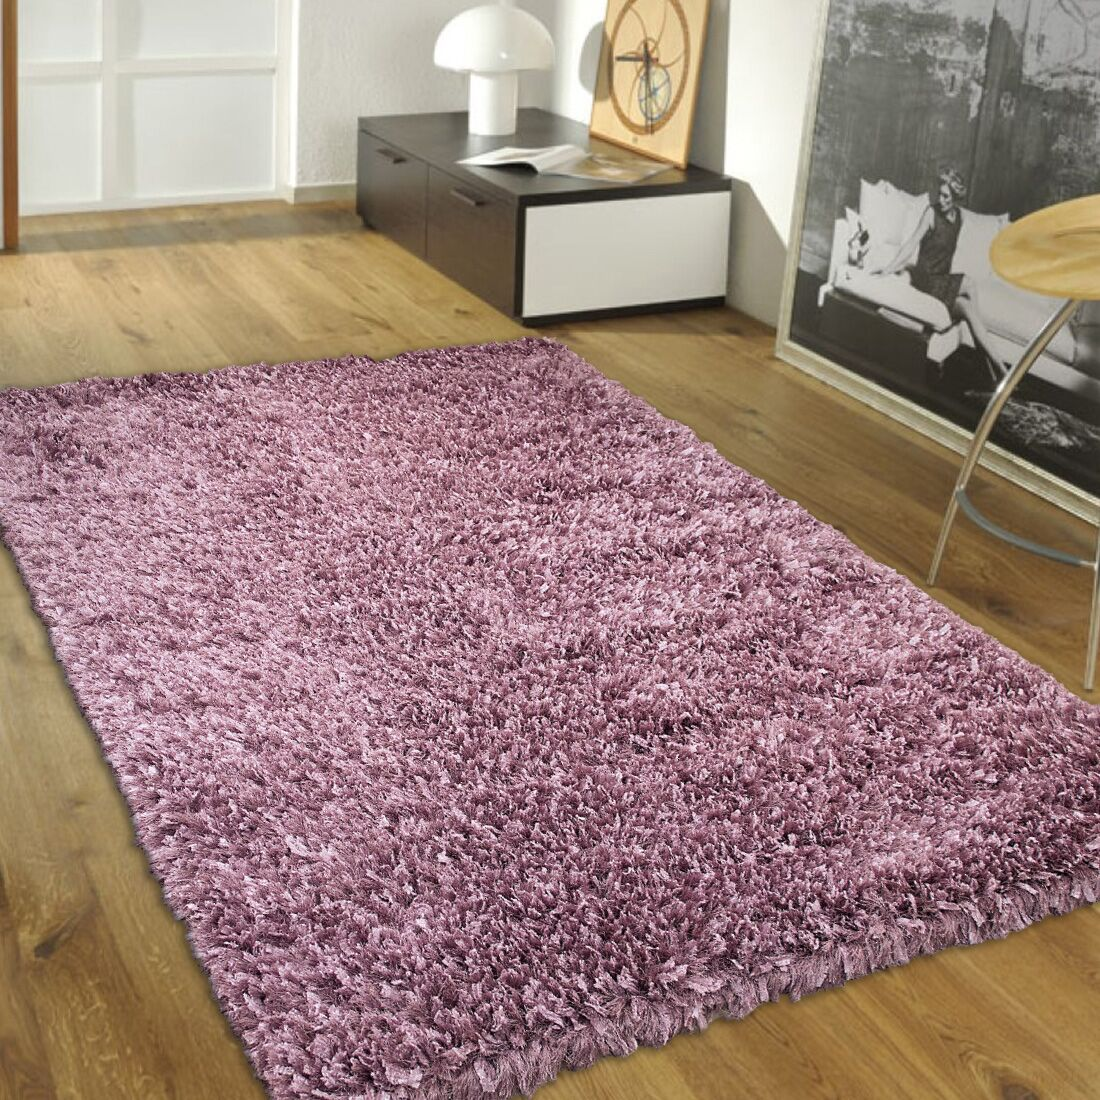 Handmade Purple Area Rug Rug Size: 7' x 10'2